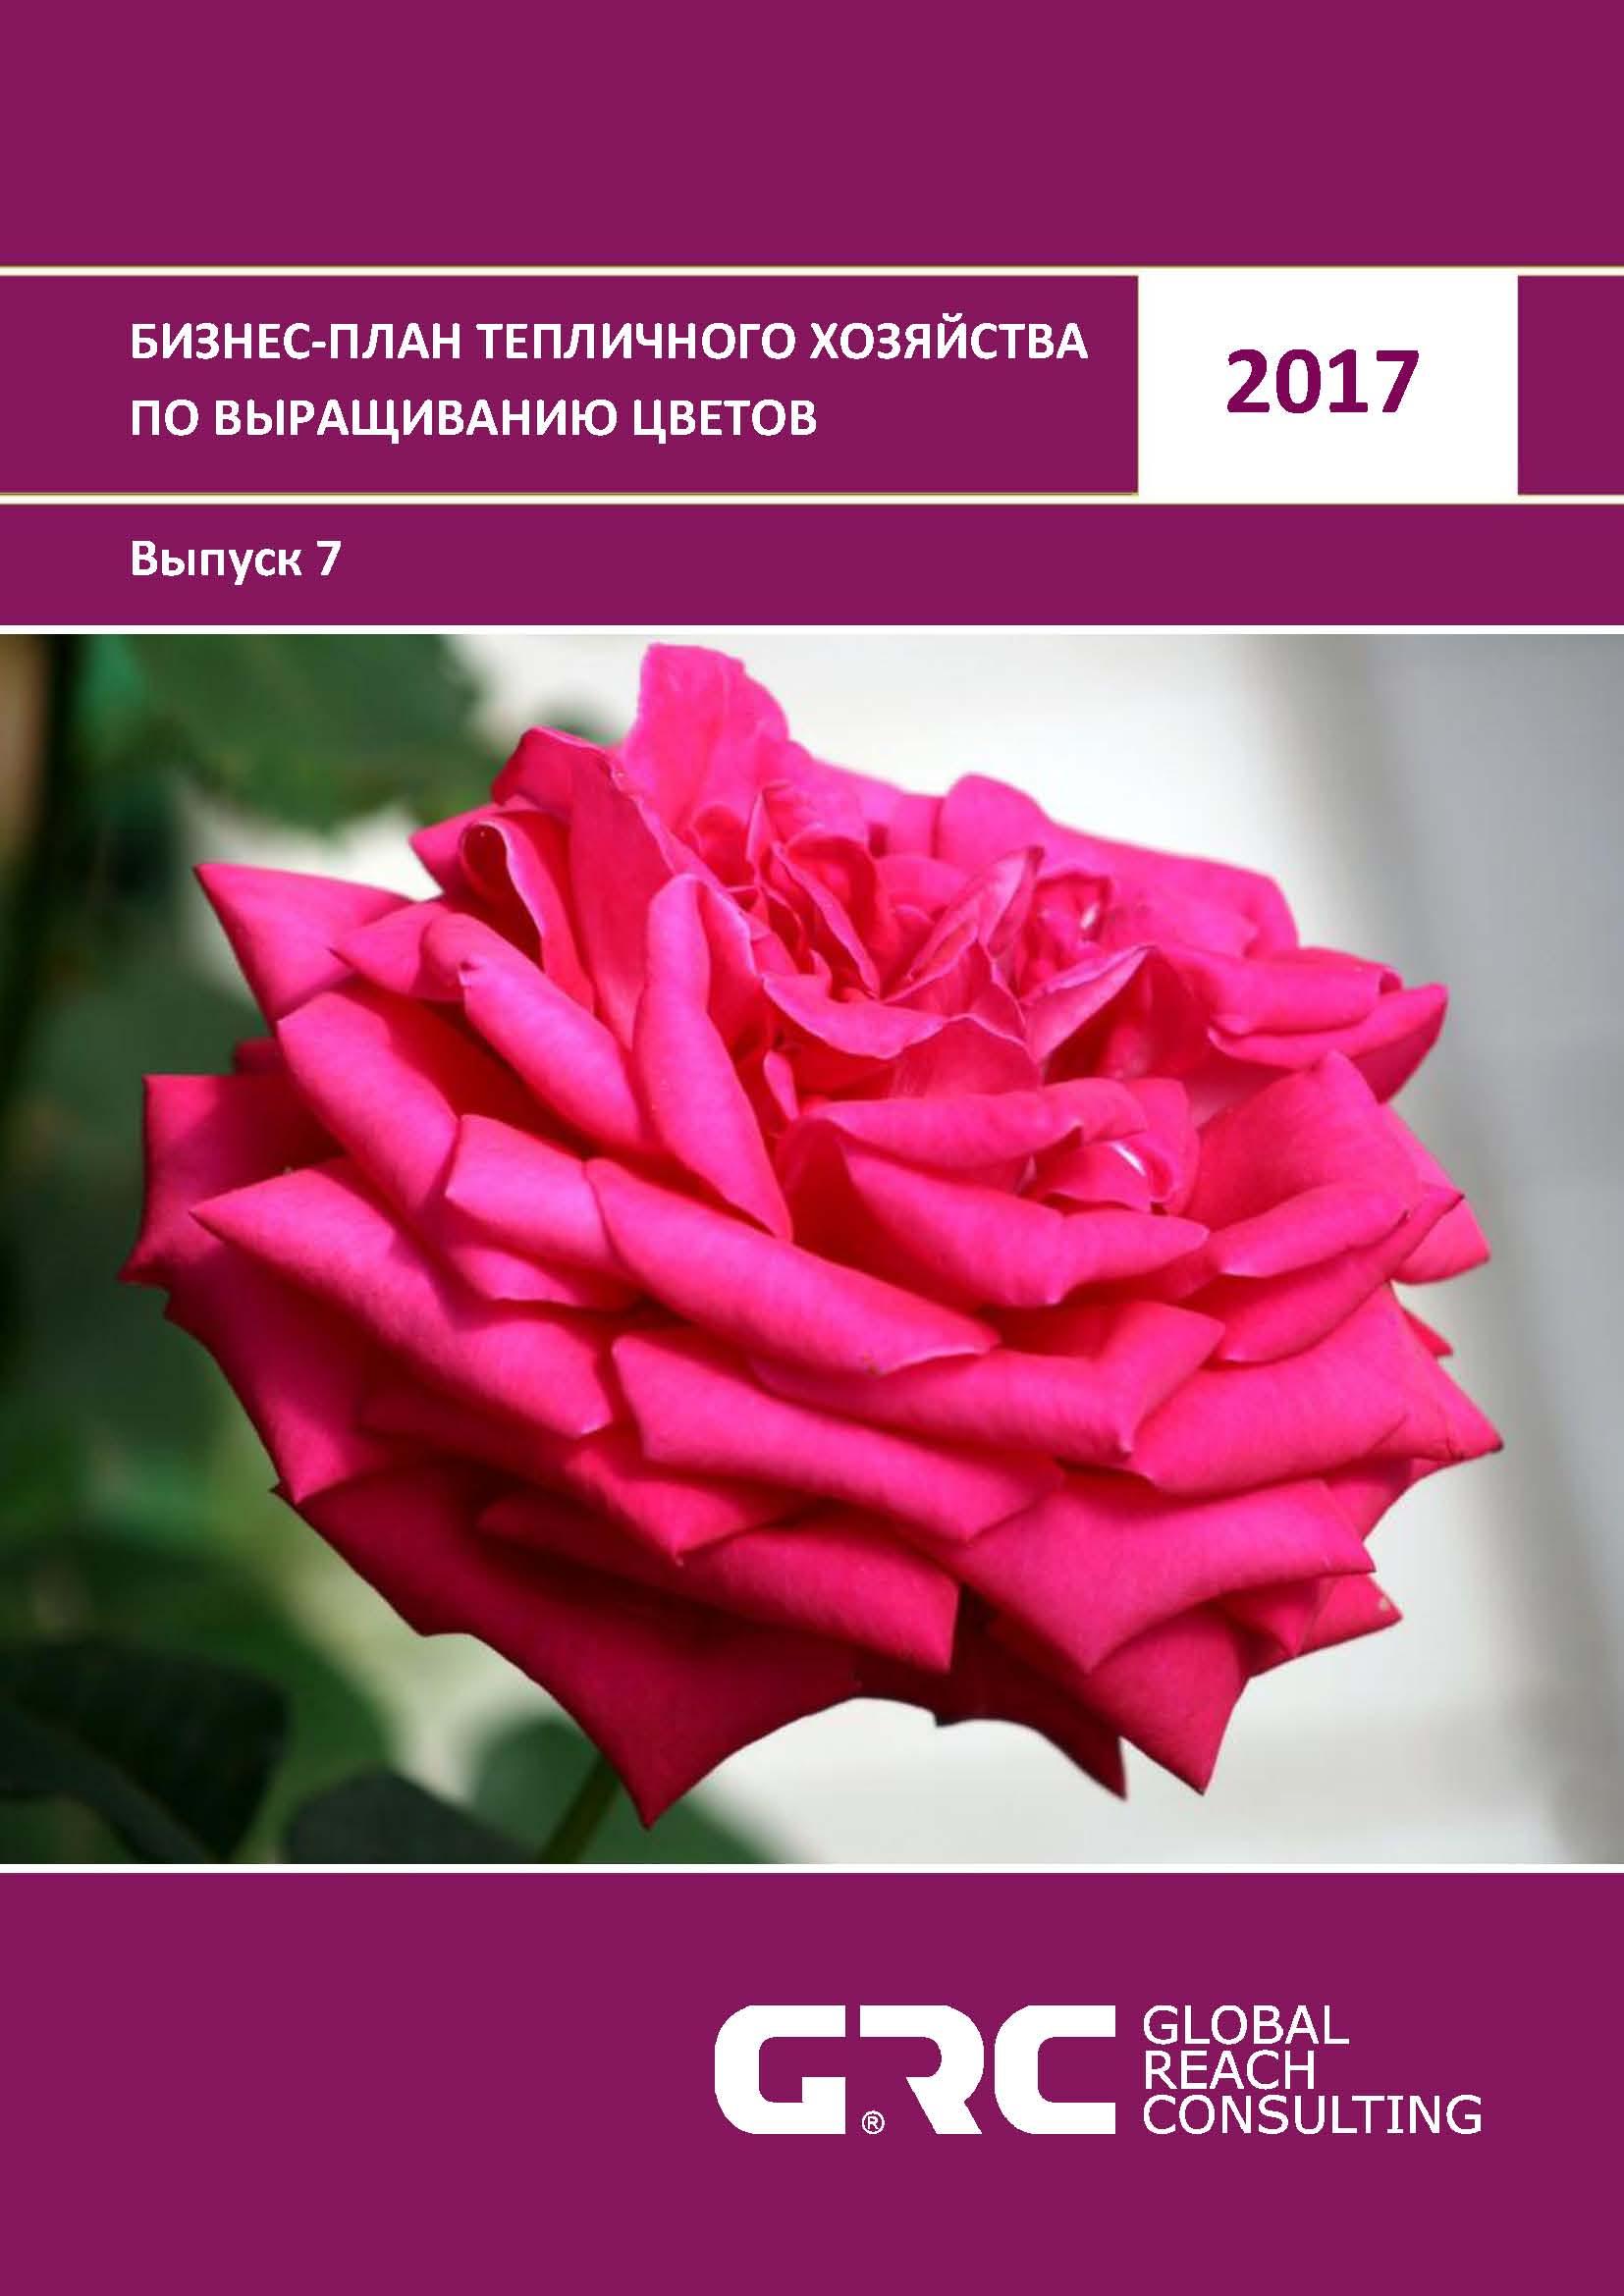 бизнес план хозяйства по выращиванию цветов поиска